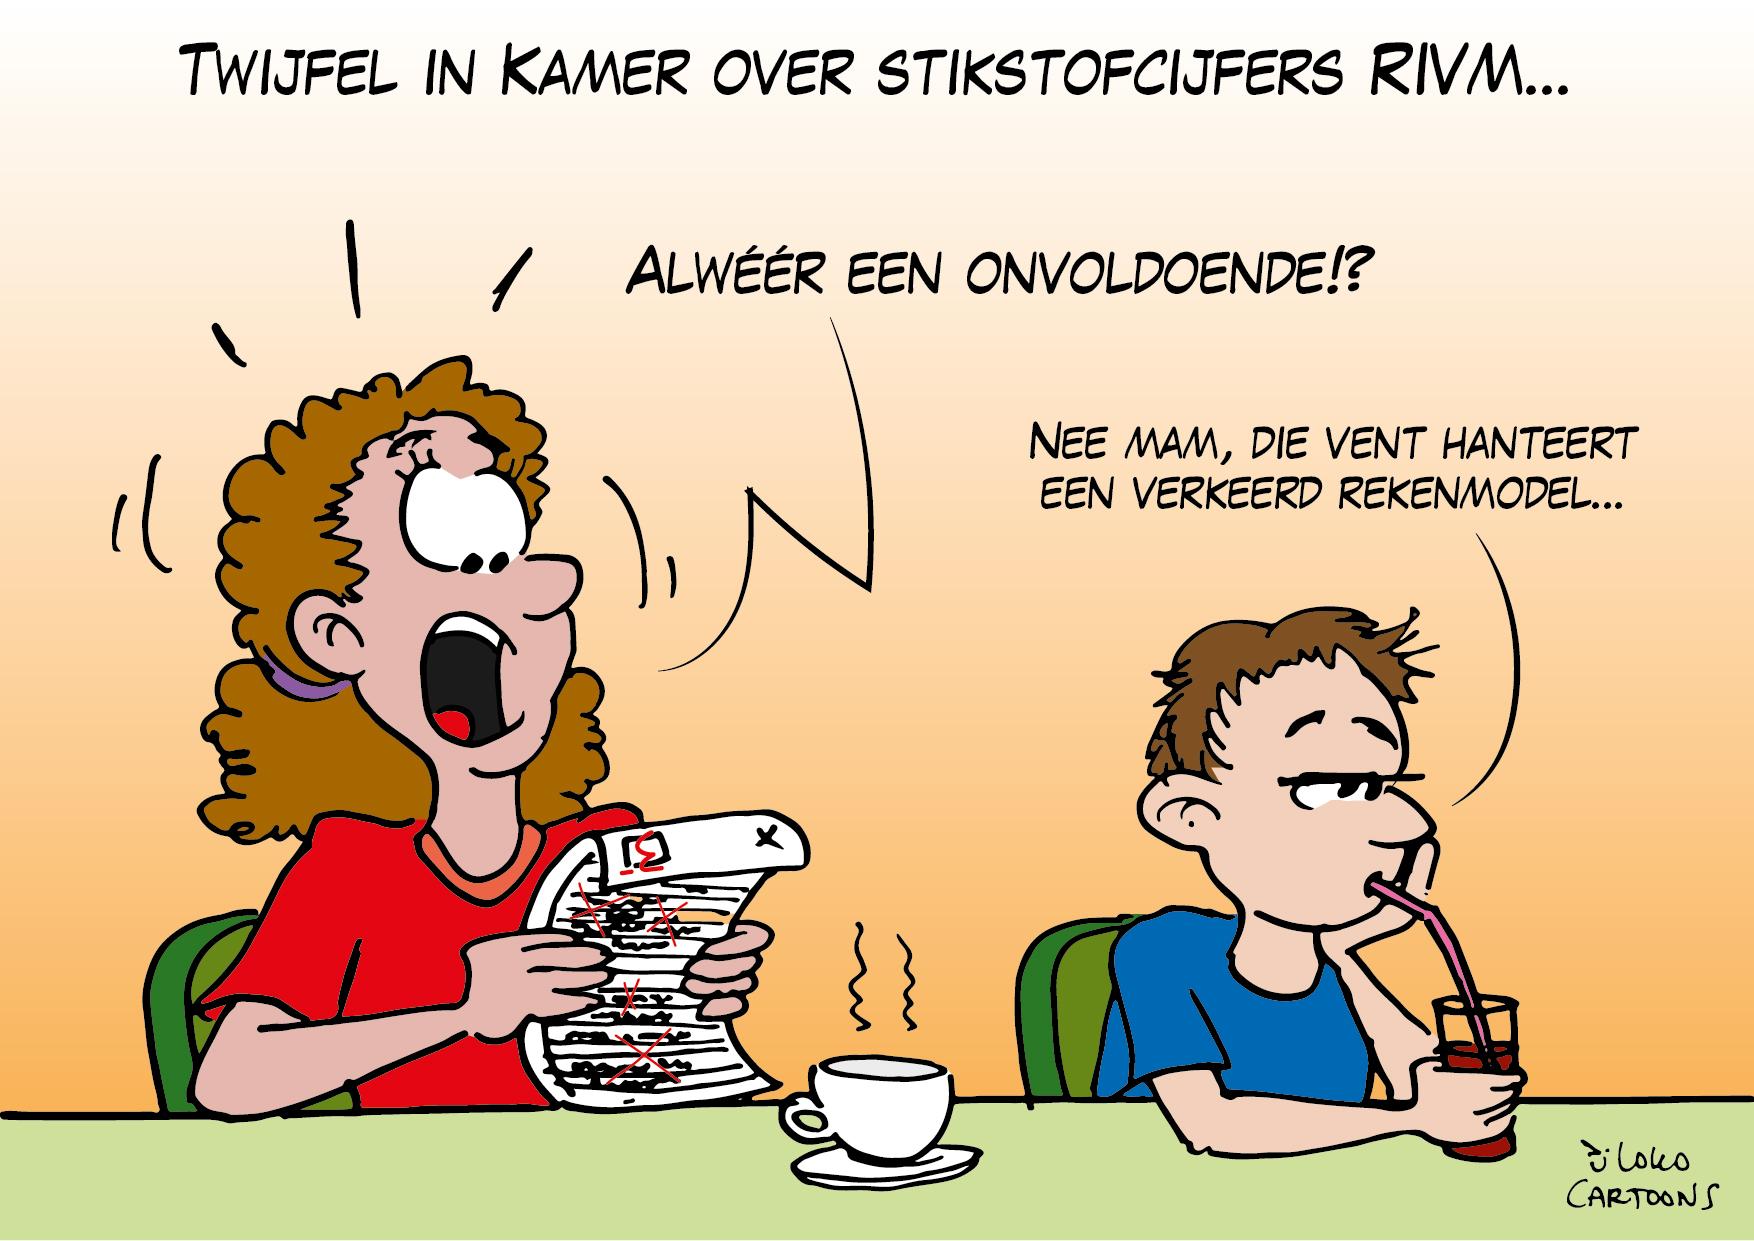 Twijfel in Kamer over stifstofcijfers RIVM…